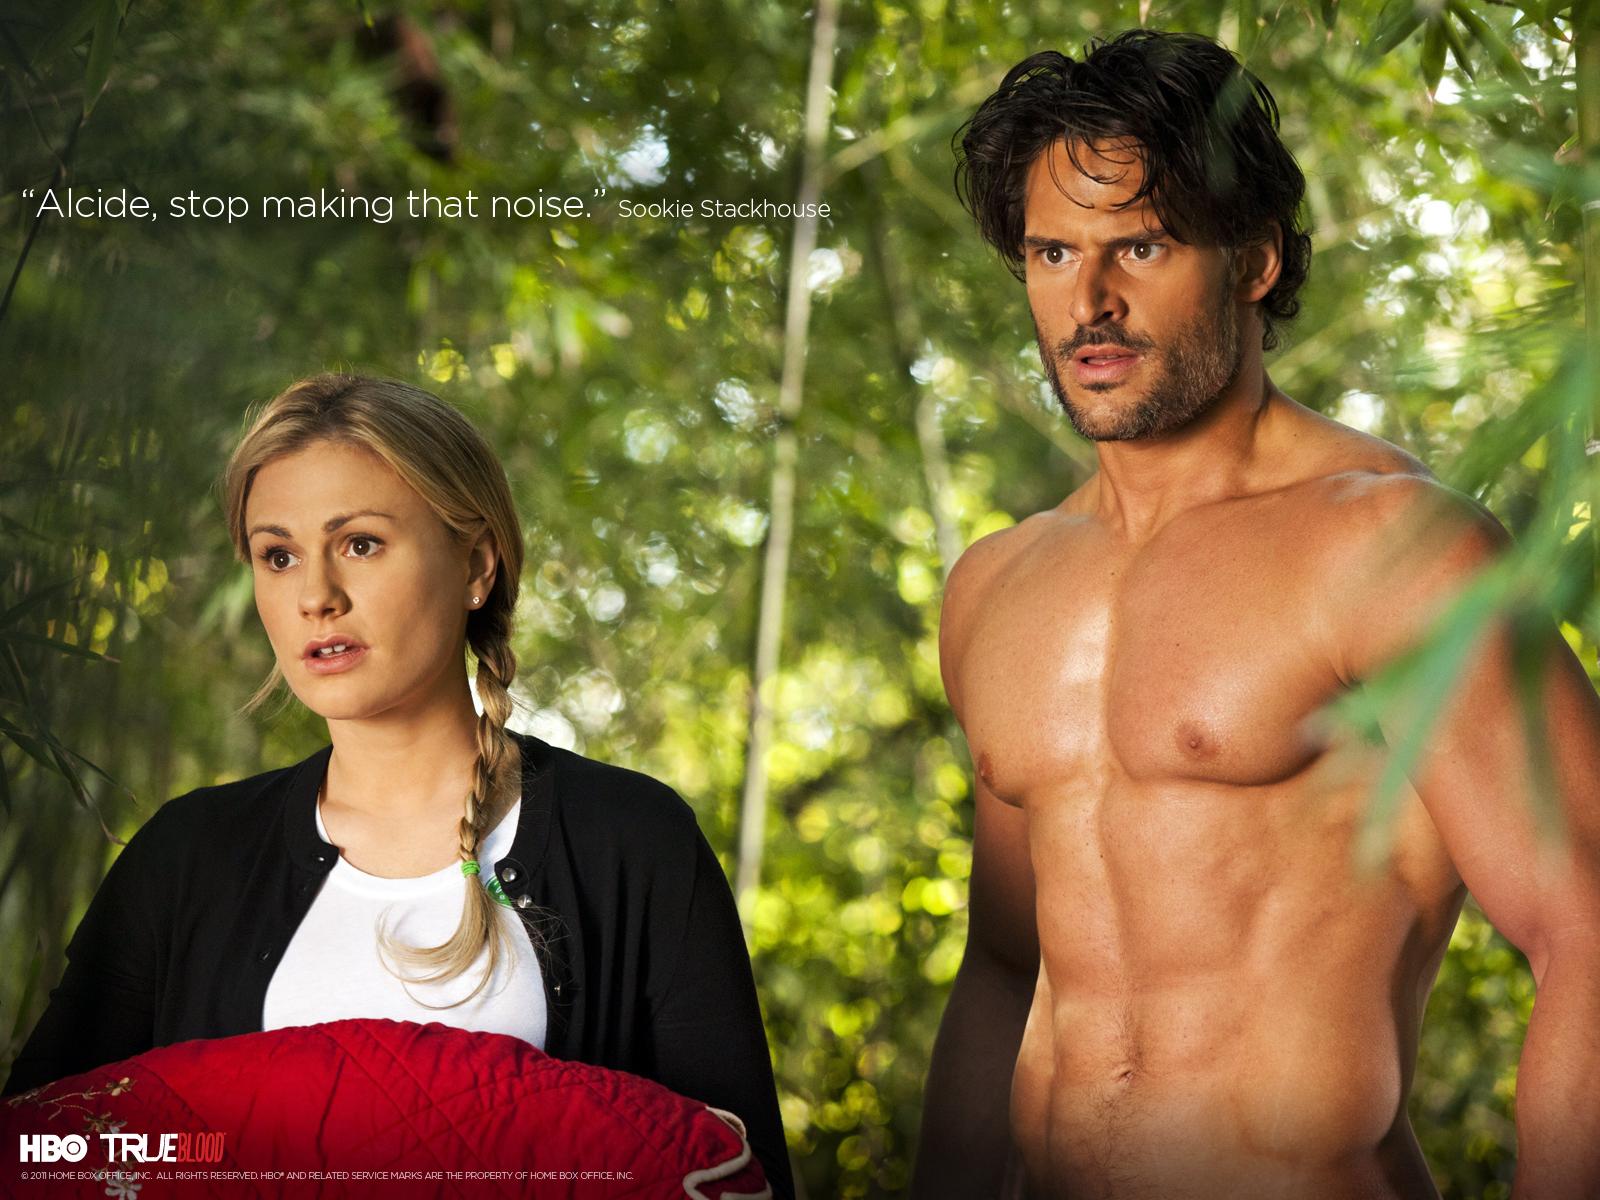 Alcide and Sookie - Season 4